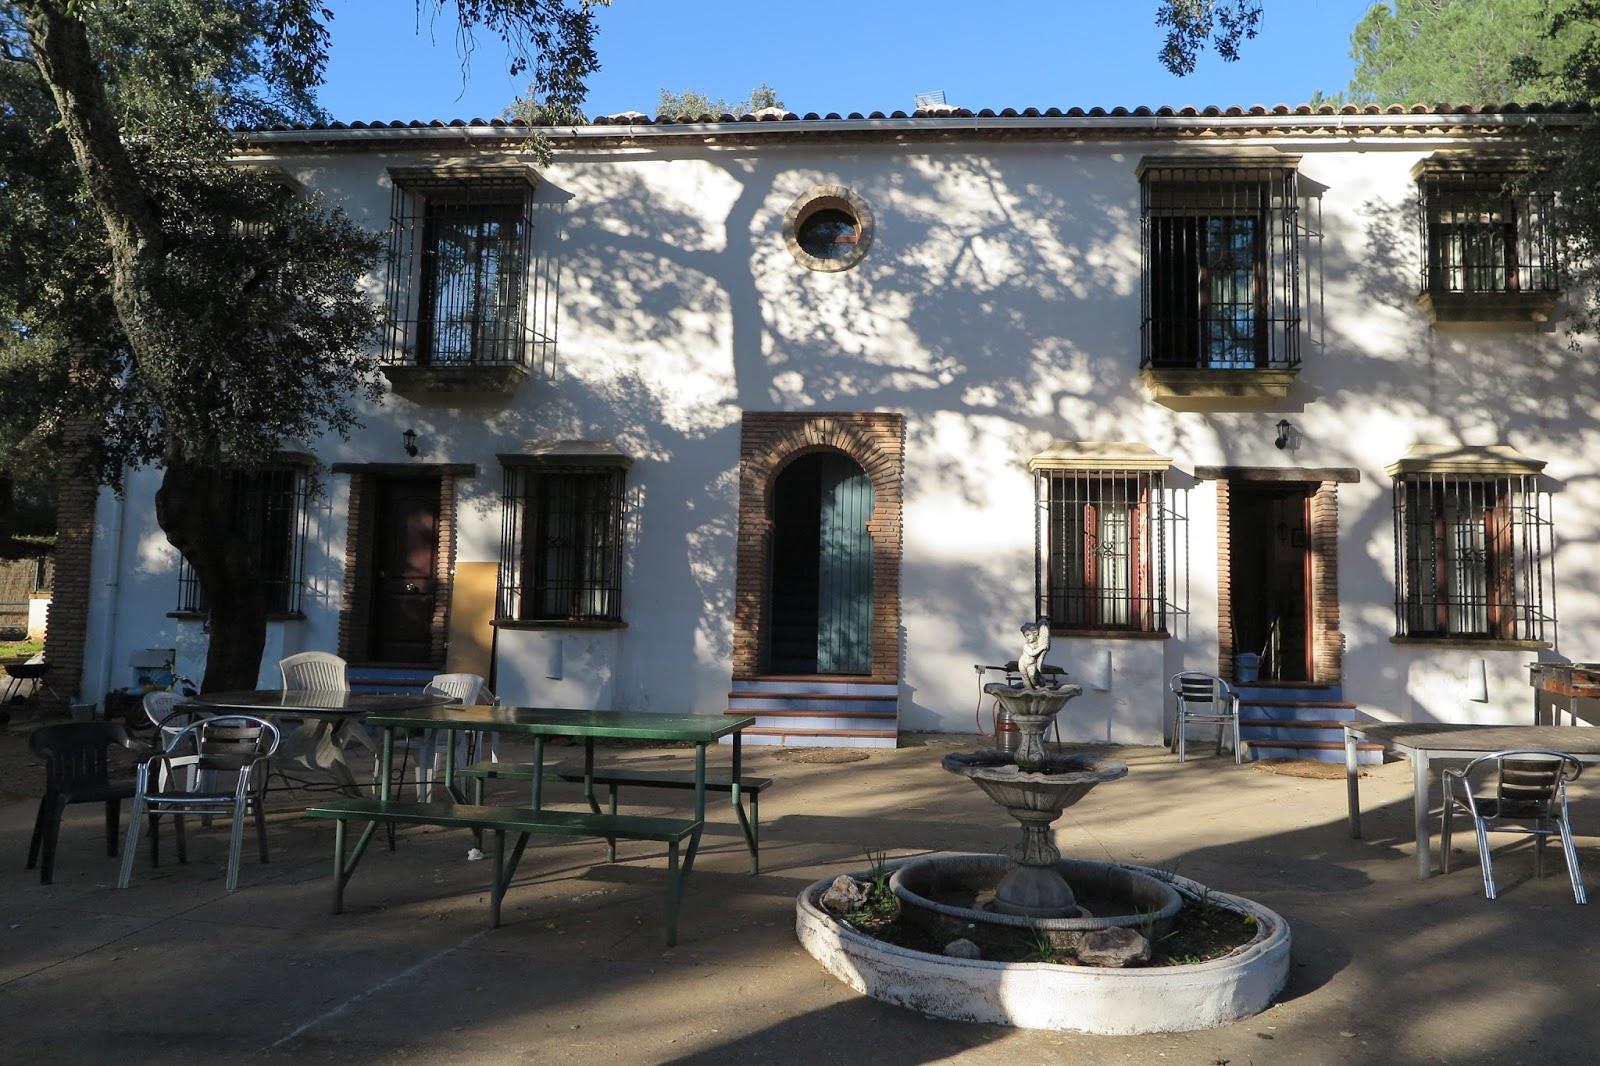 Gr 48 travesia de la sierra morena 10 etapa almodovar - Casa rural sierra morena ...